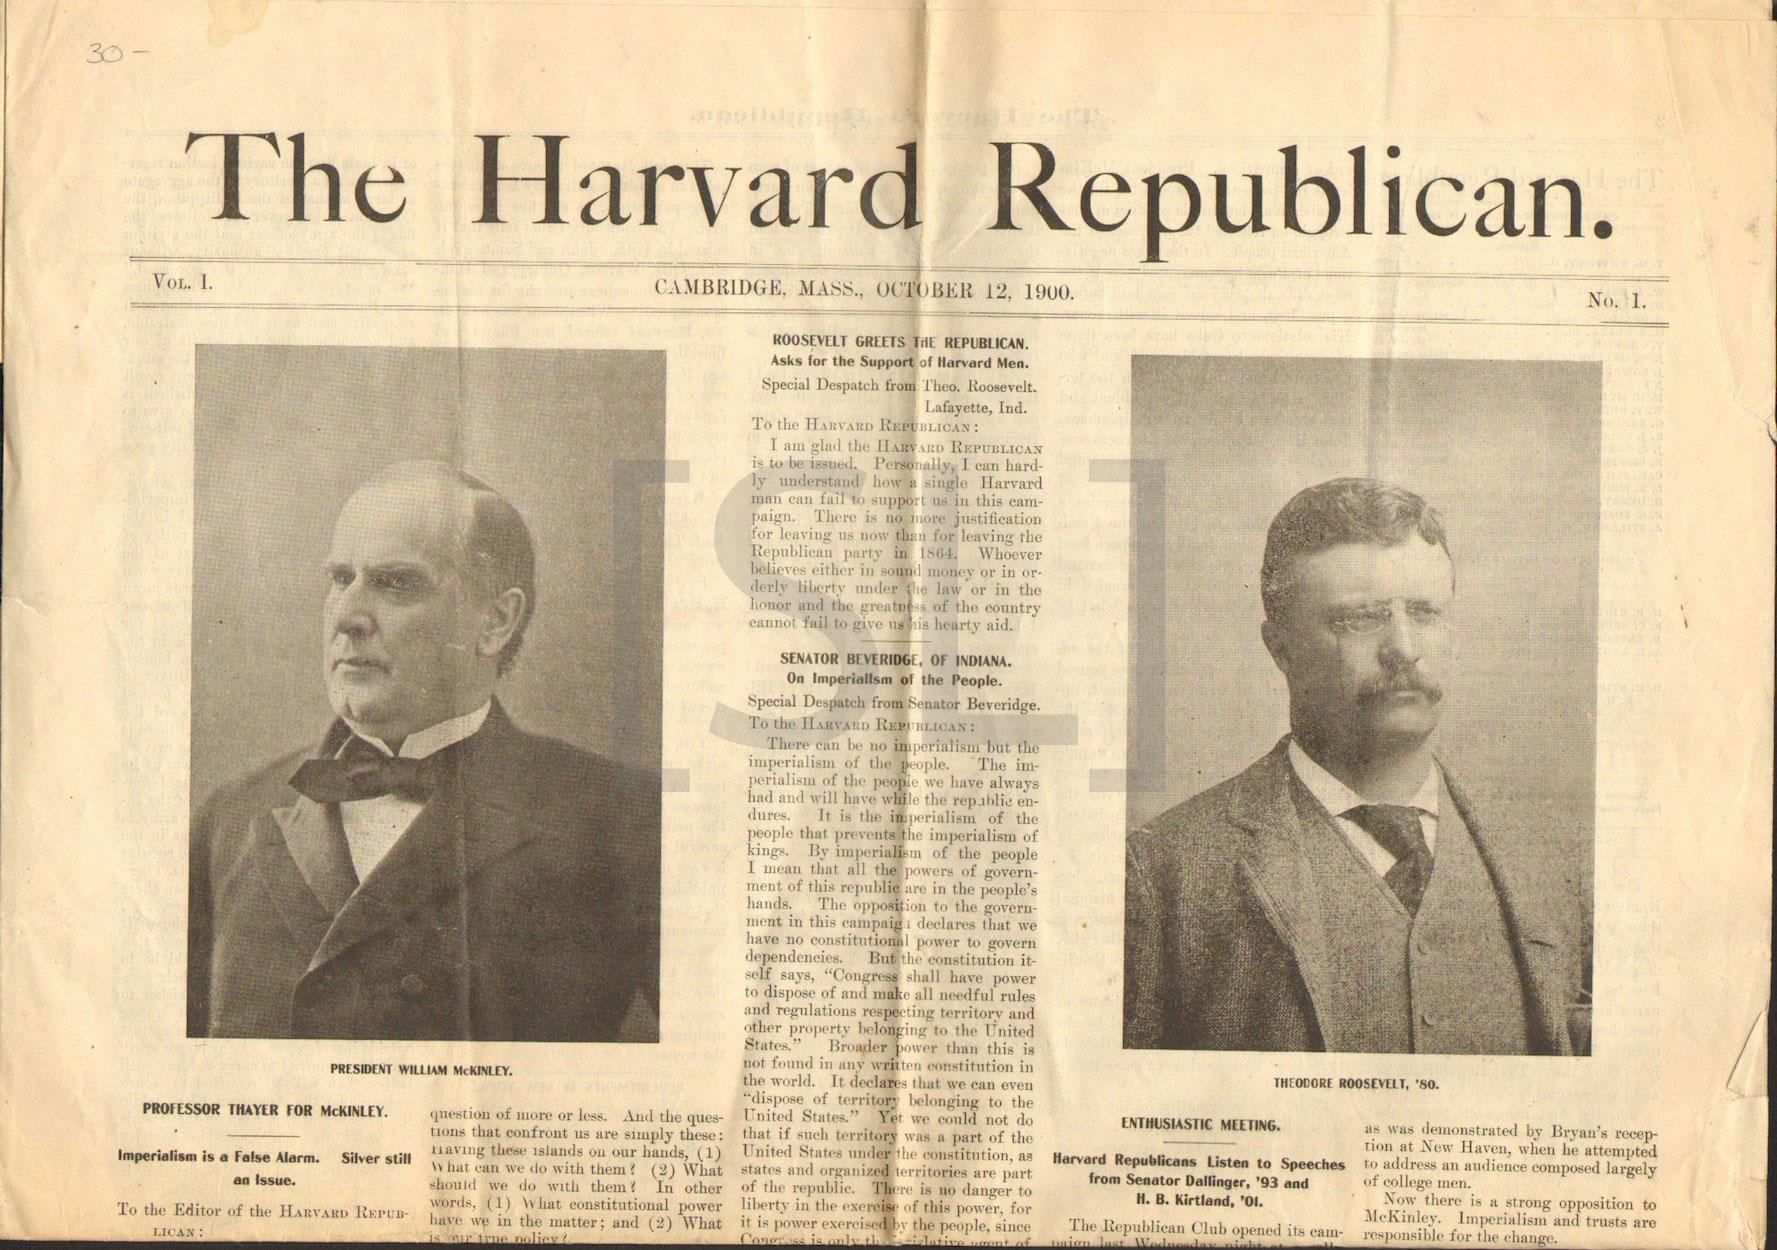 Harvard Republican